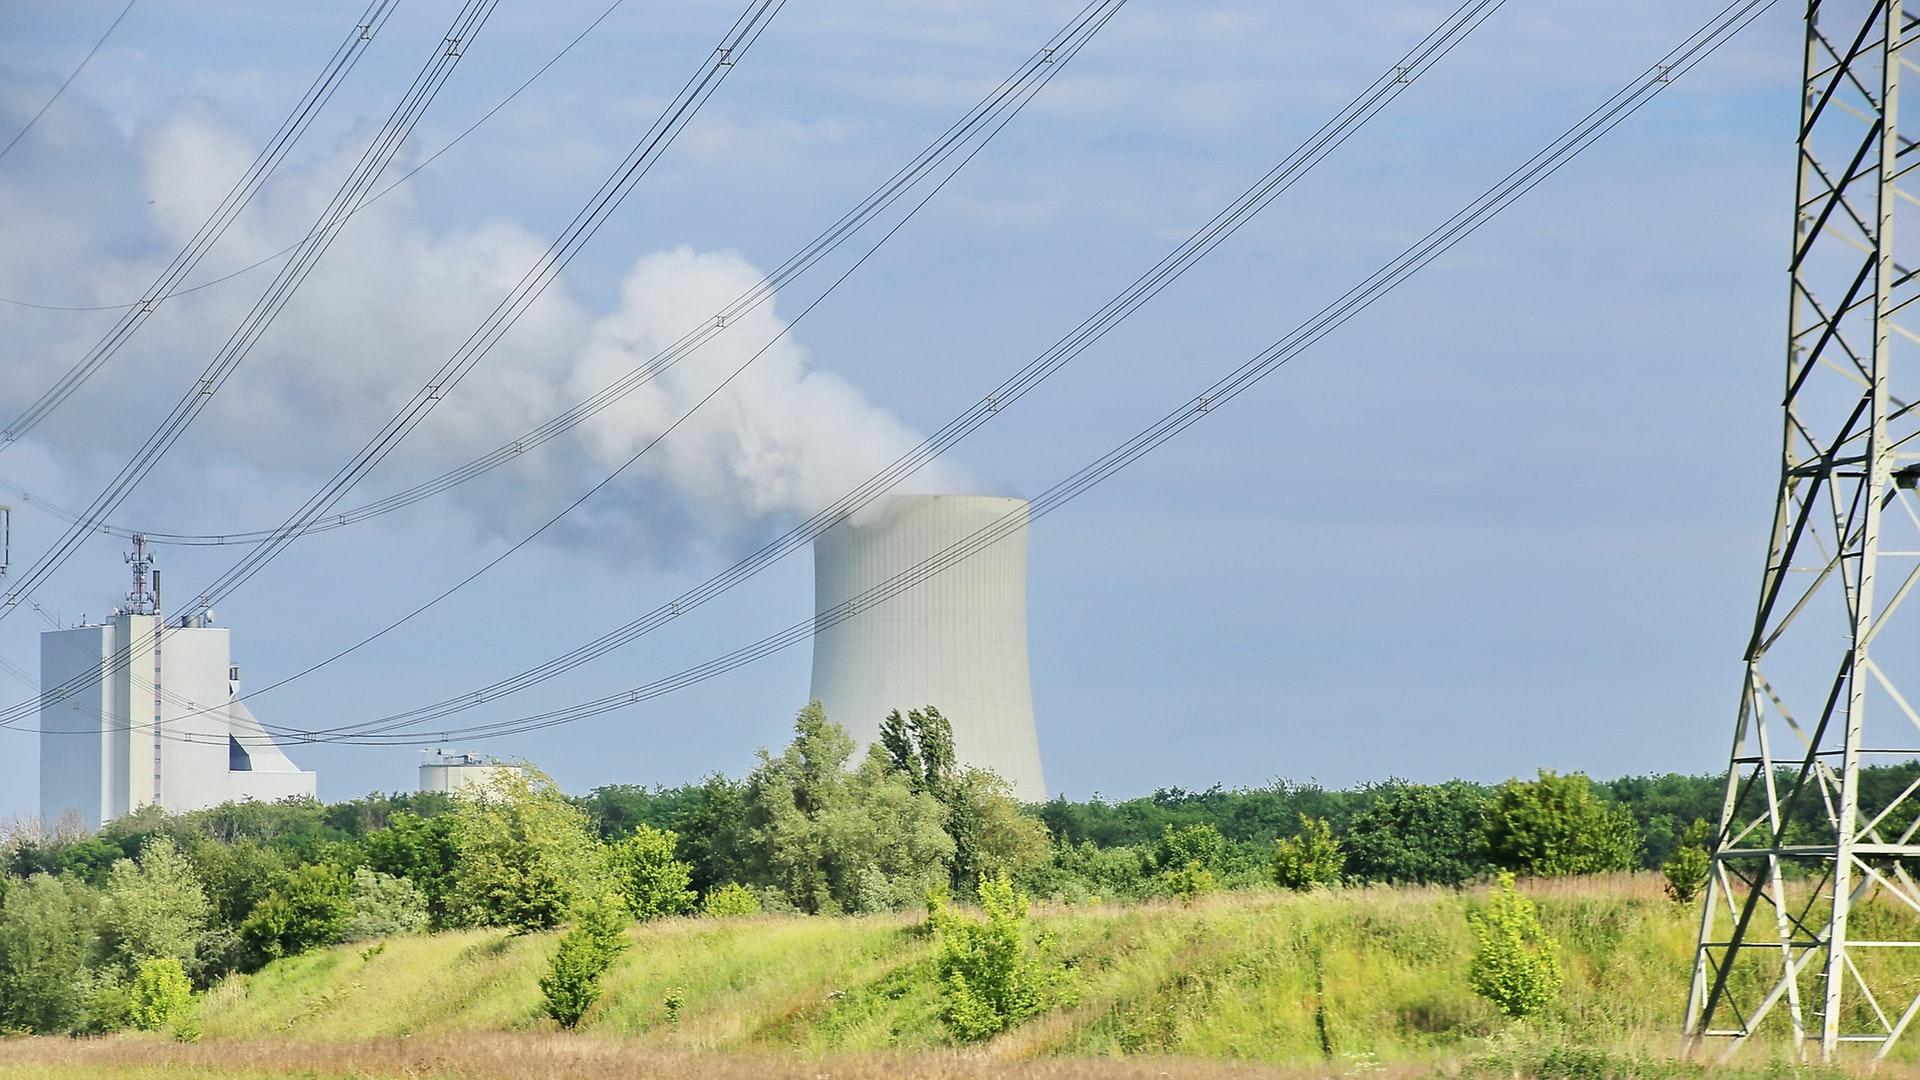 Kohle in Deutschland noch profitabel?